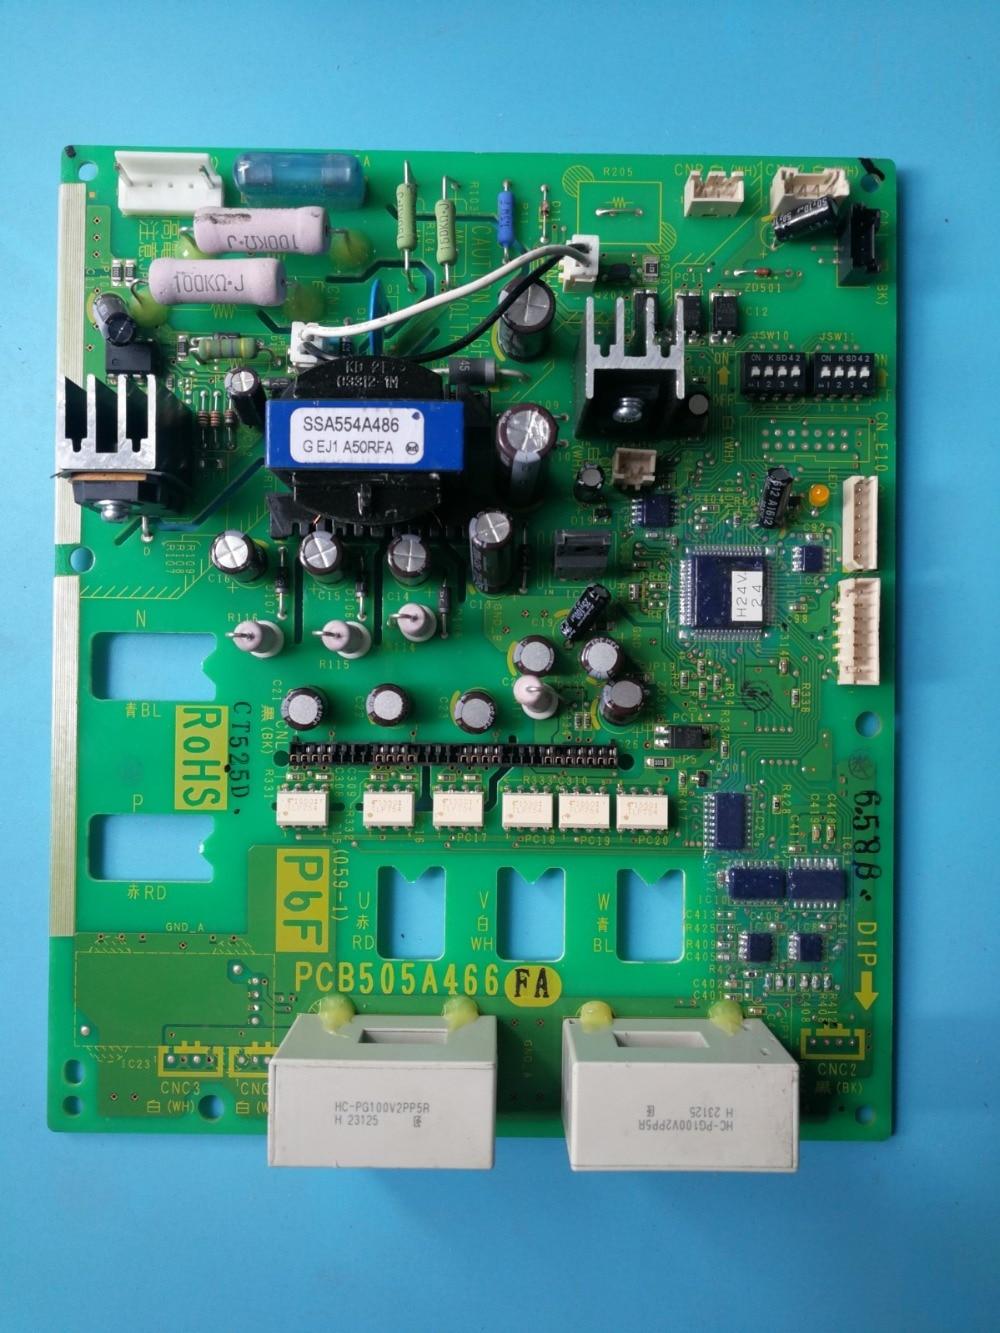 PCB505A466FA Good Working Tested